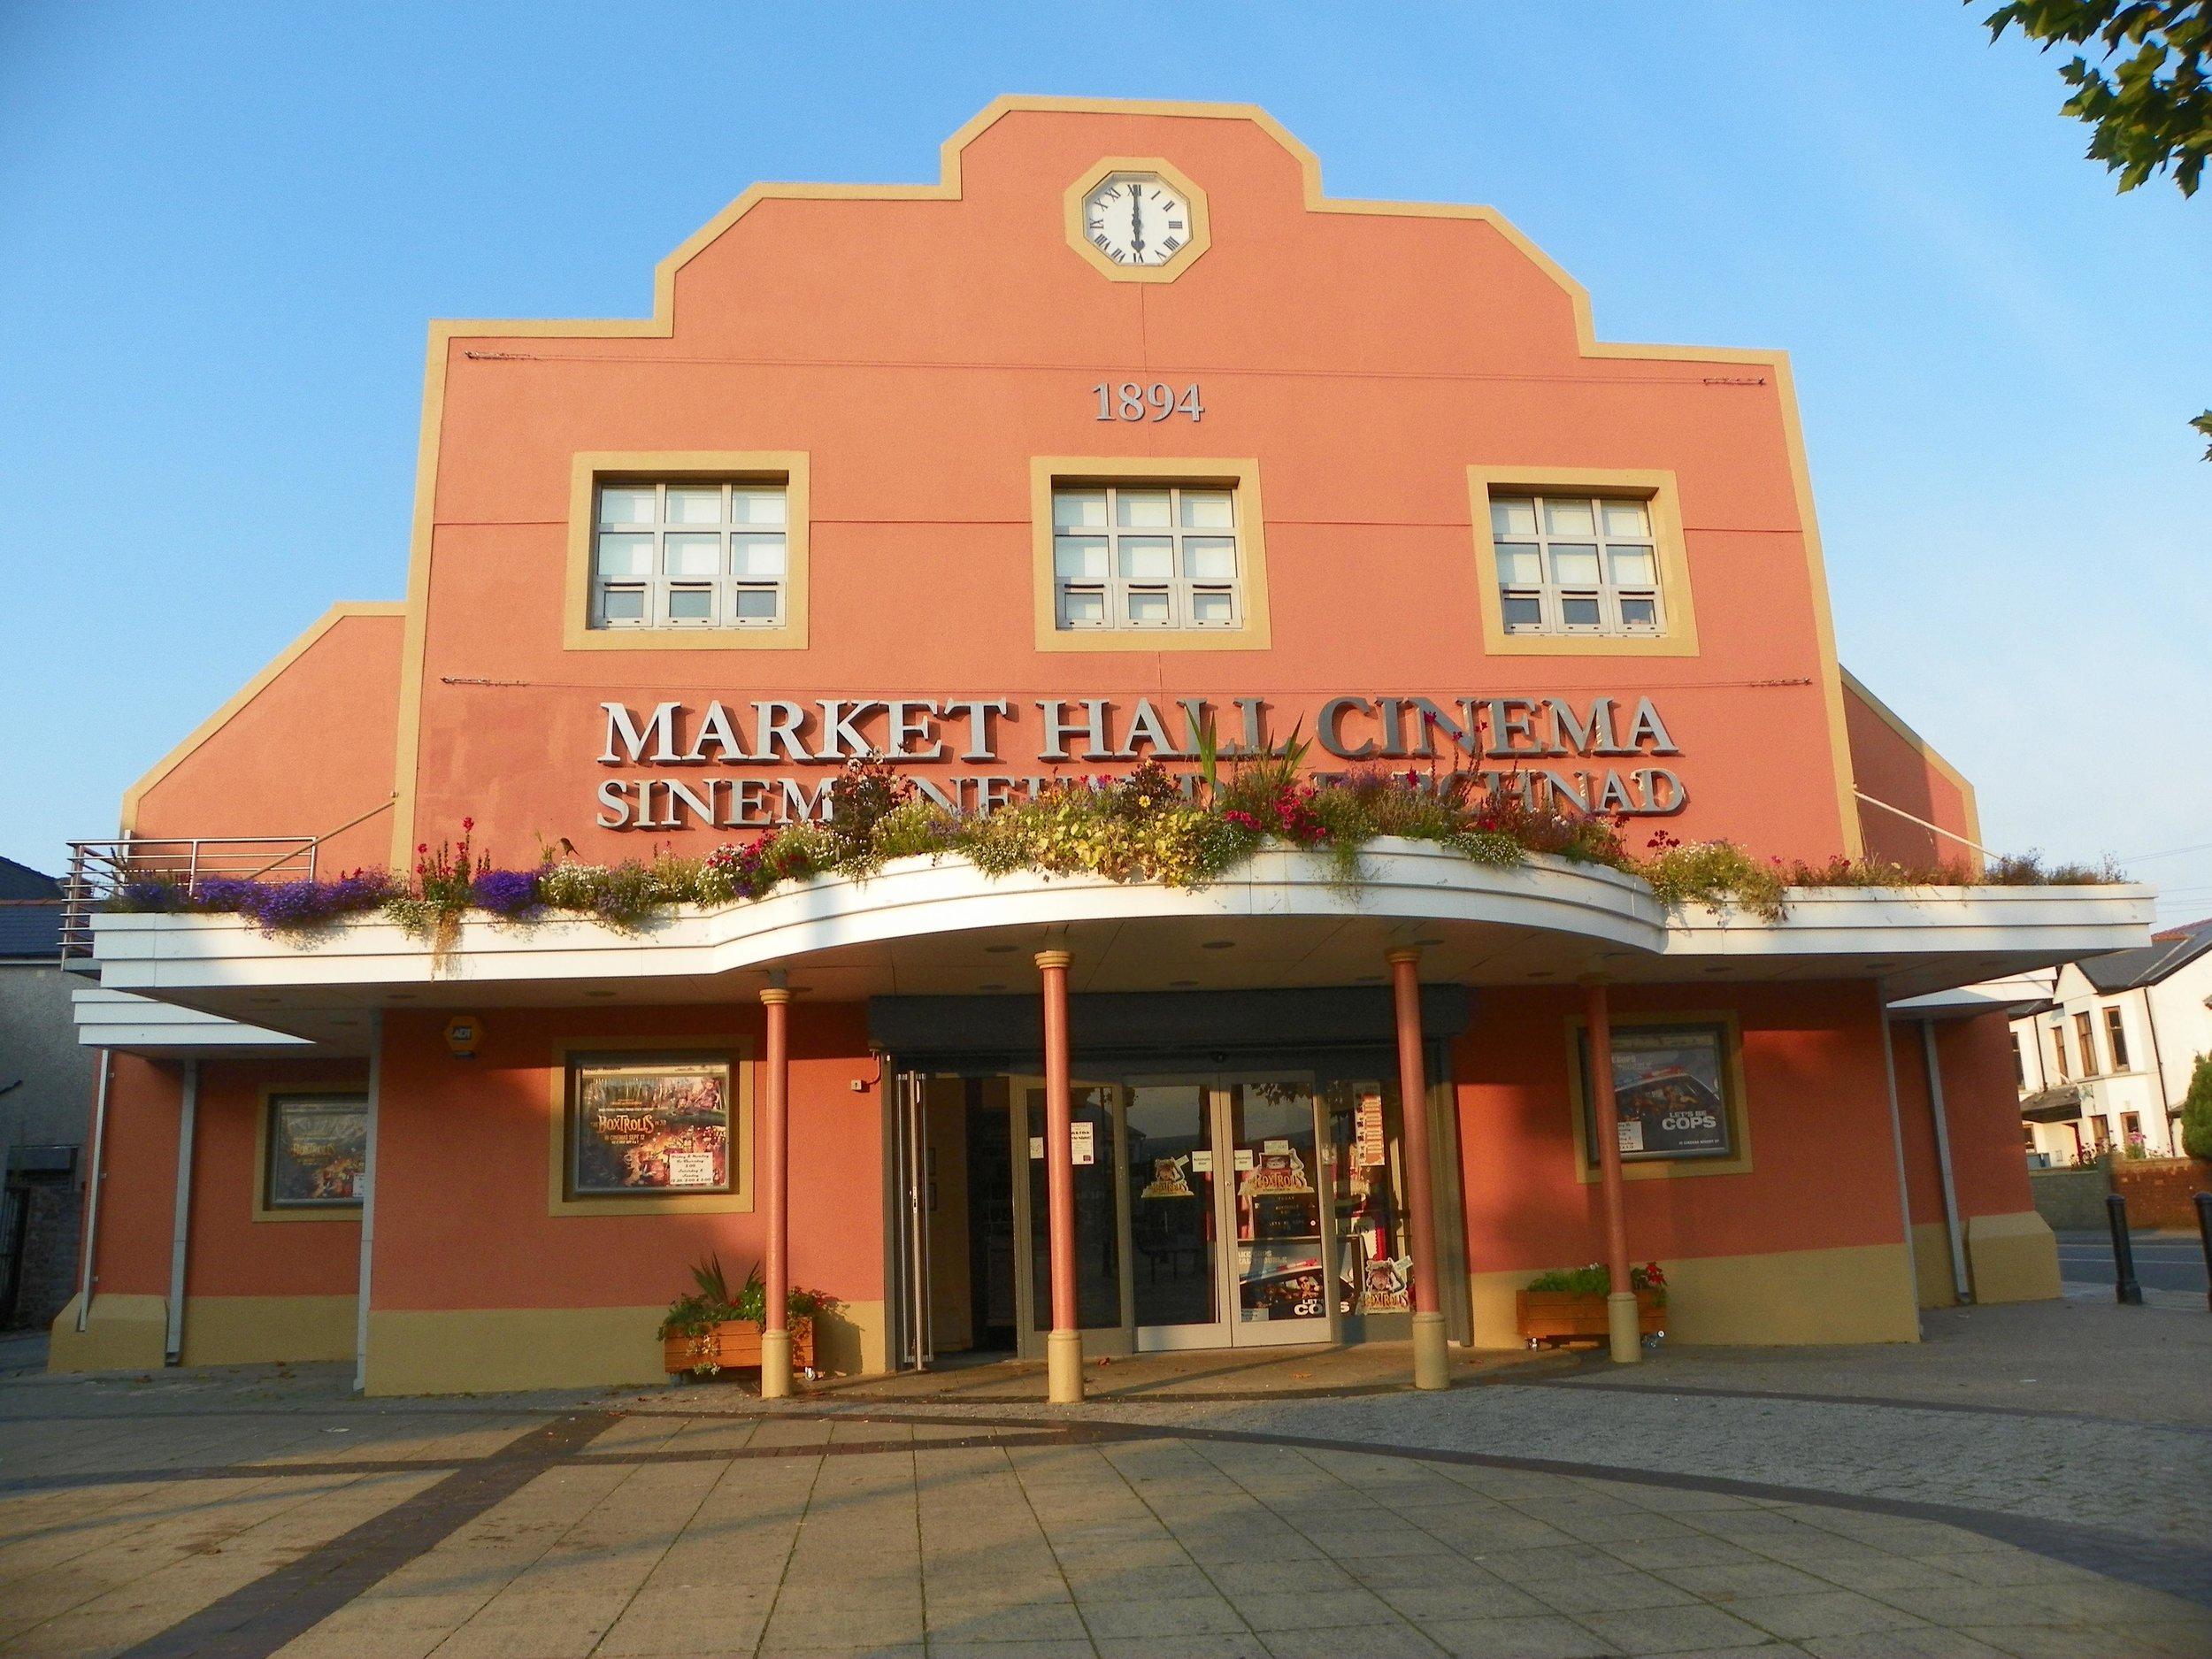 Market Hall Cinema - 01495 310576Market Square, Brynmawr,NP23 4AJ